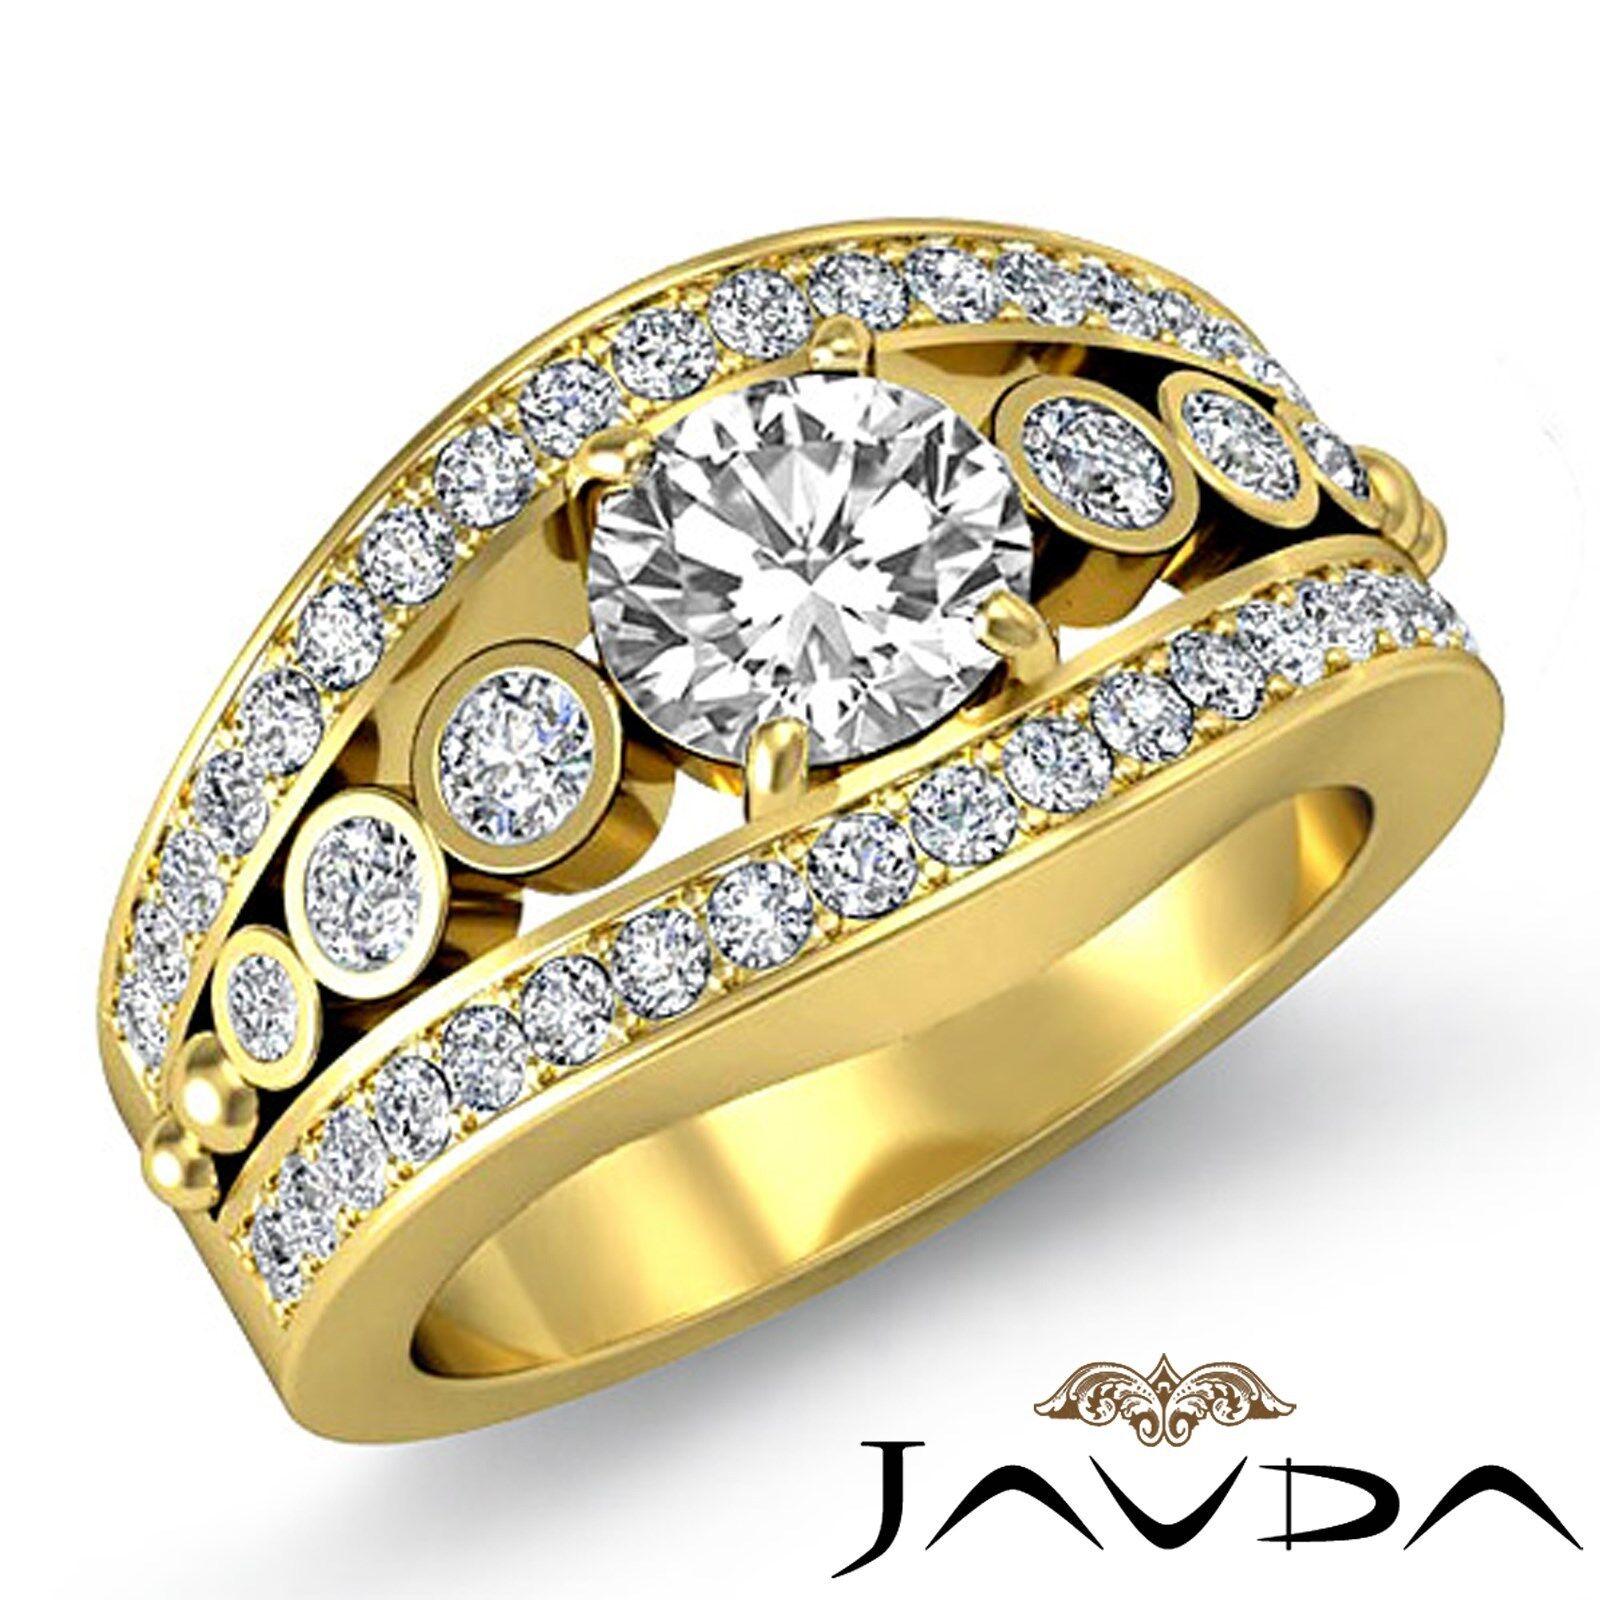 Micro Pave Bezel Setting Round Diamond Engagement Wedding Ring GIA I SI1 2.25 Ct